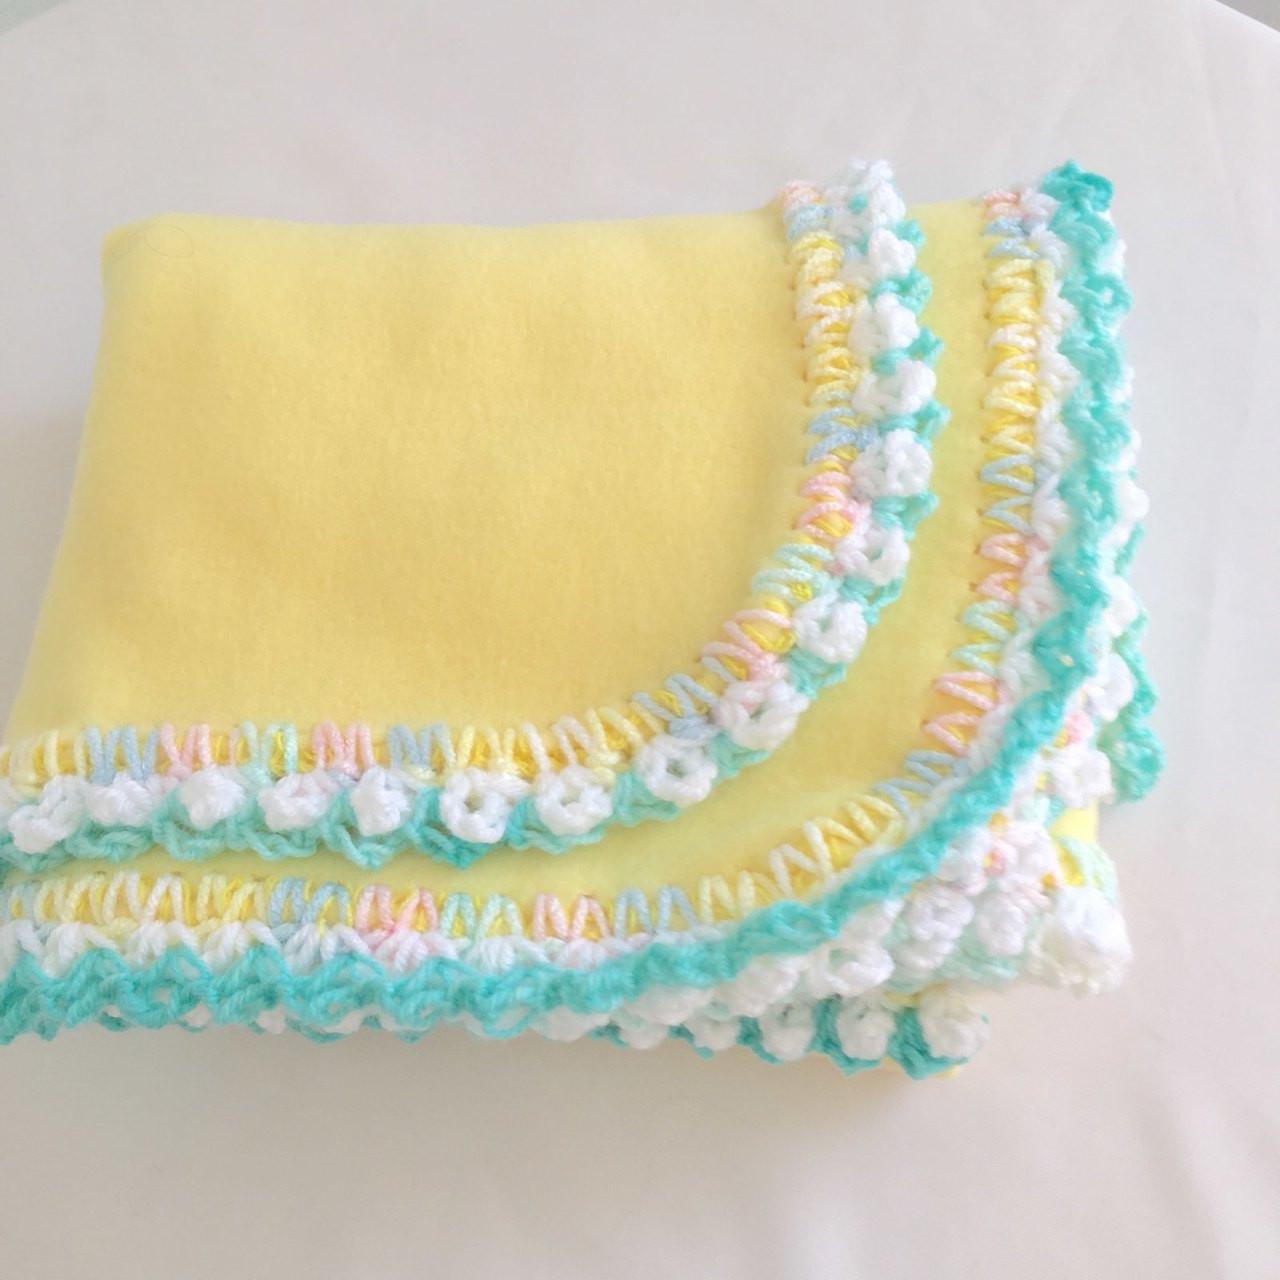 Rainbow Cotton Candy Polar Fleece Baby Blanket Country Look Hand Crocheted Border Rainbow White Ice Green Free Shipping Shop1707llc